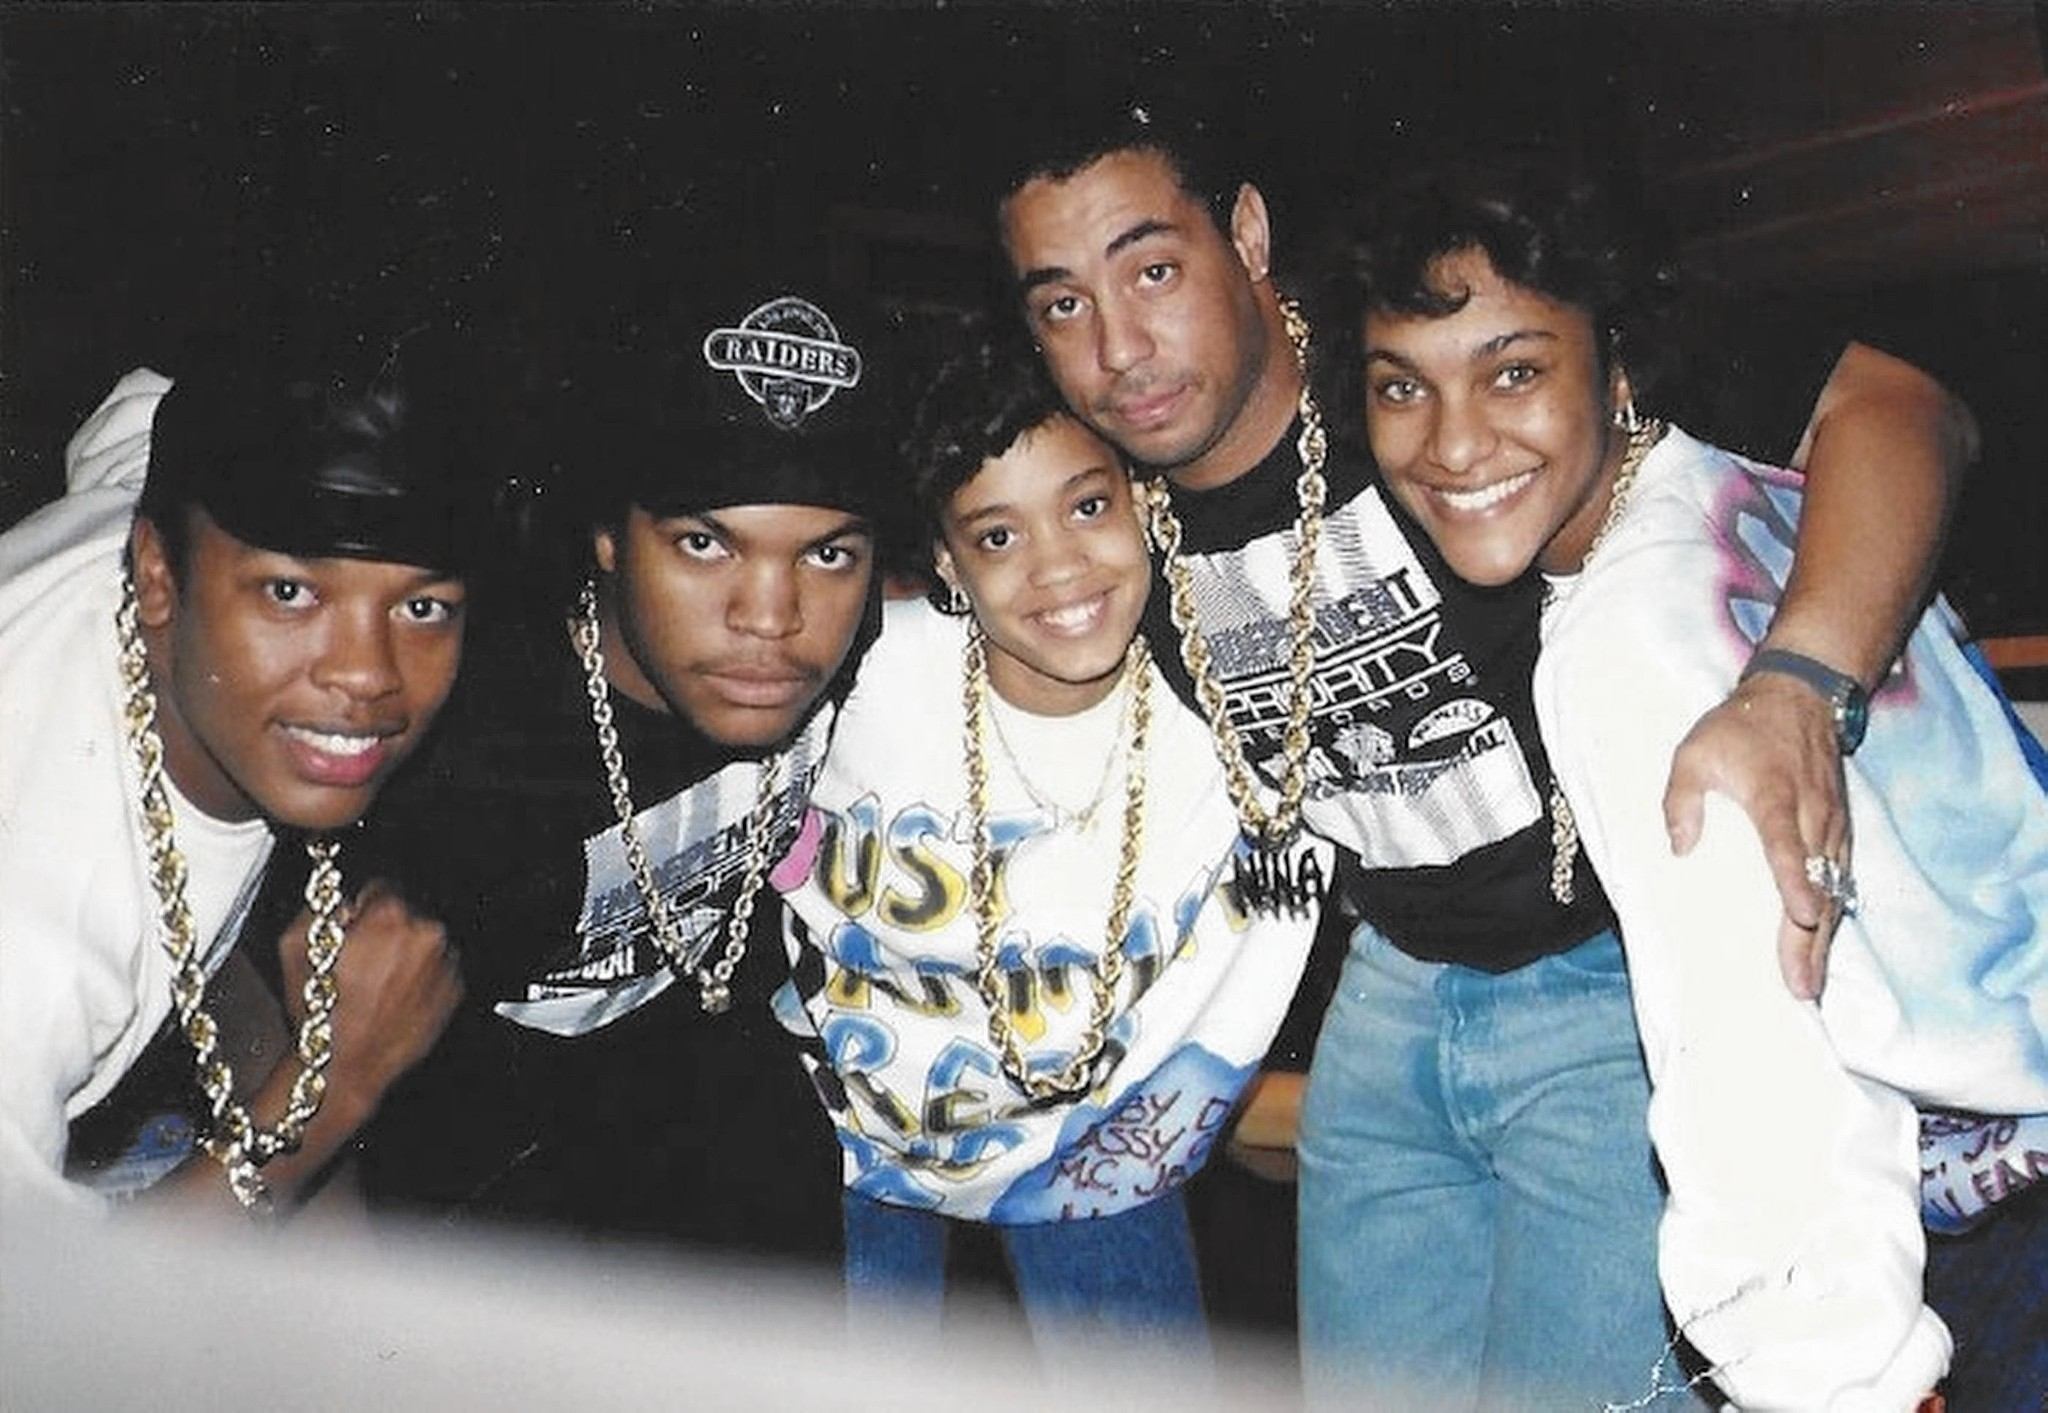 L to R: Dr. Dre, Ice Cube, Dania 'Baby D' Burks, DJ Yella & Juana 'MC J.B.' Burns.